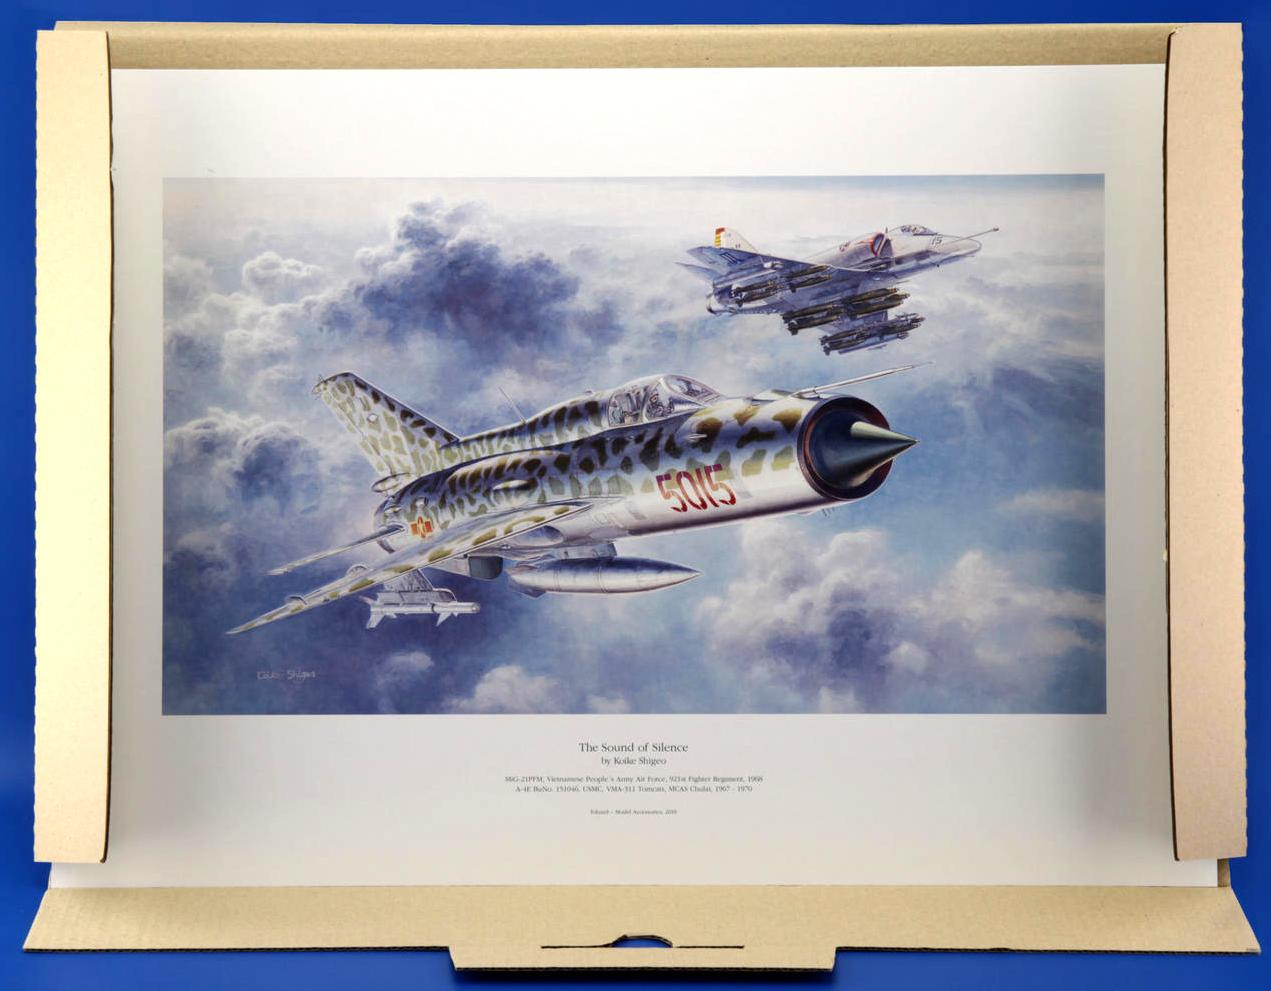 Eduard-The-Sound-of-silence-Kunstdruck Sound of Silence ( MiG-21 und Skyhawk) 1:48 Eduard